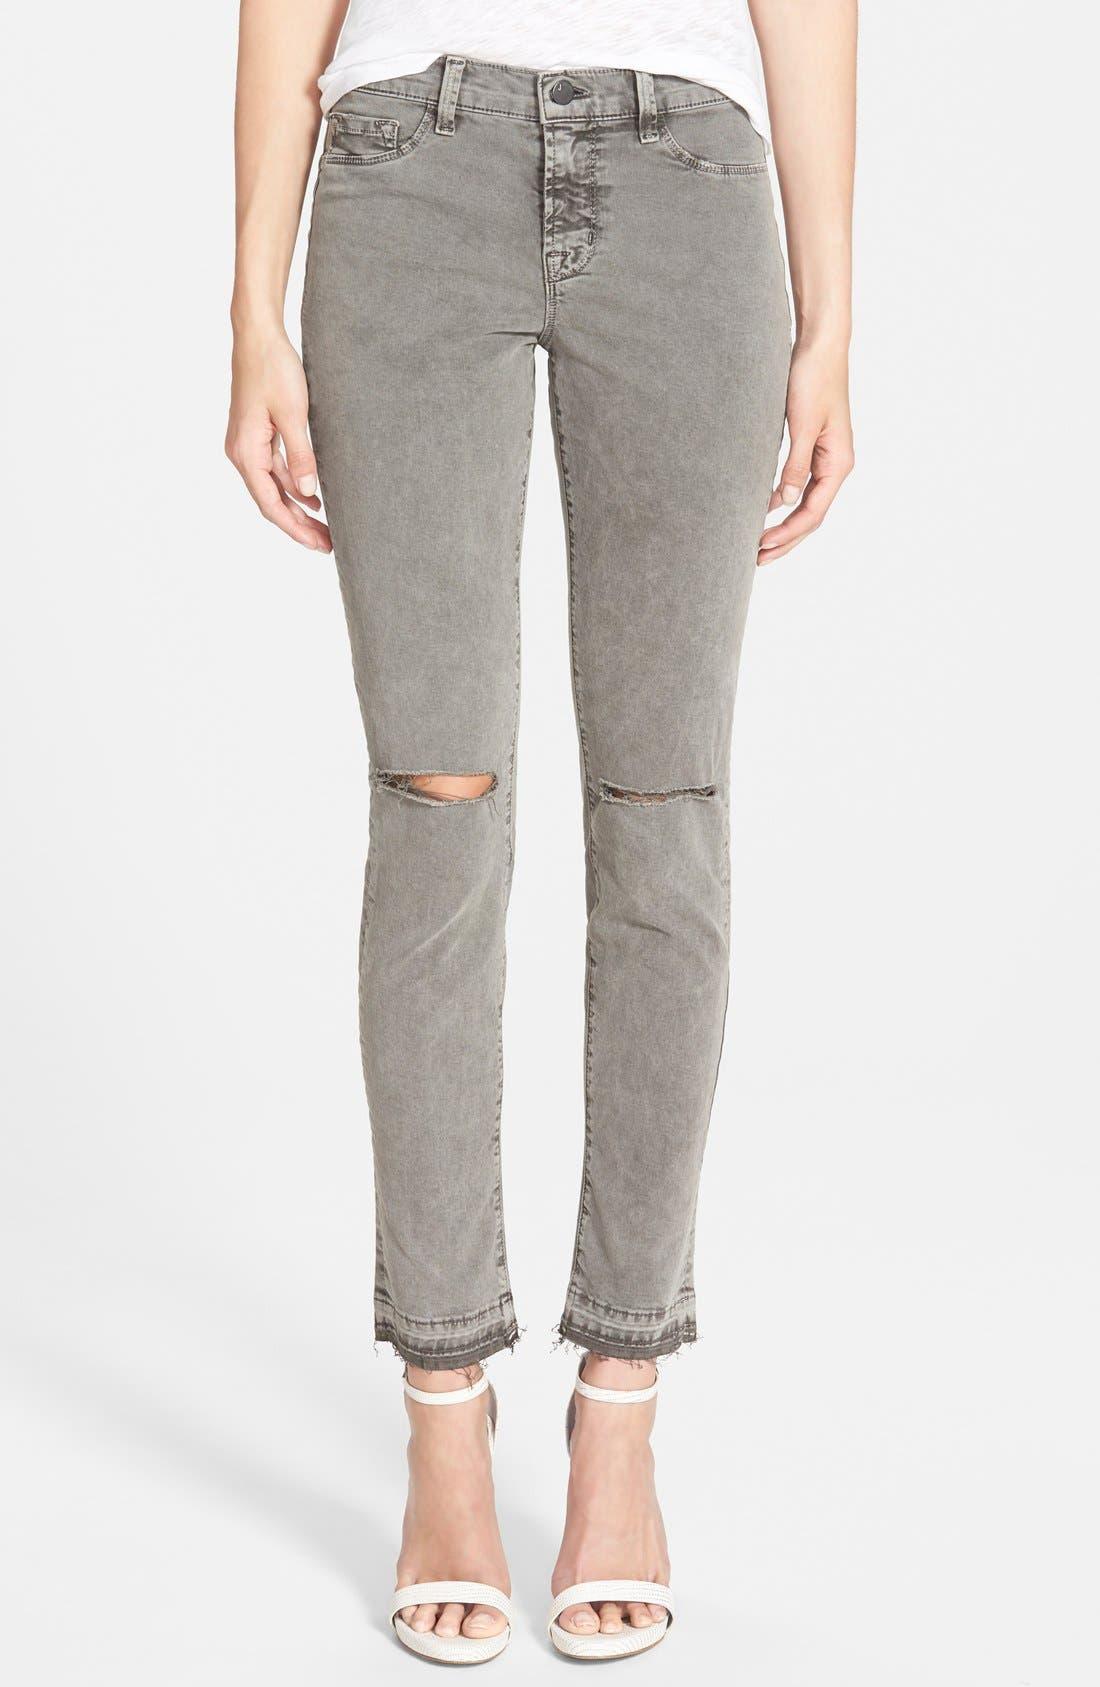 Alternate Image 1 Selected - J Brand Mid Rise Skinny Jeans